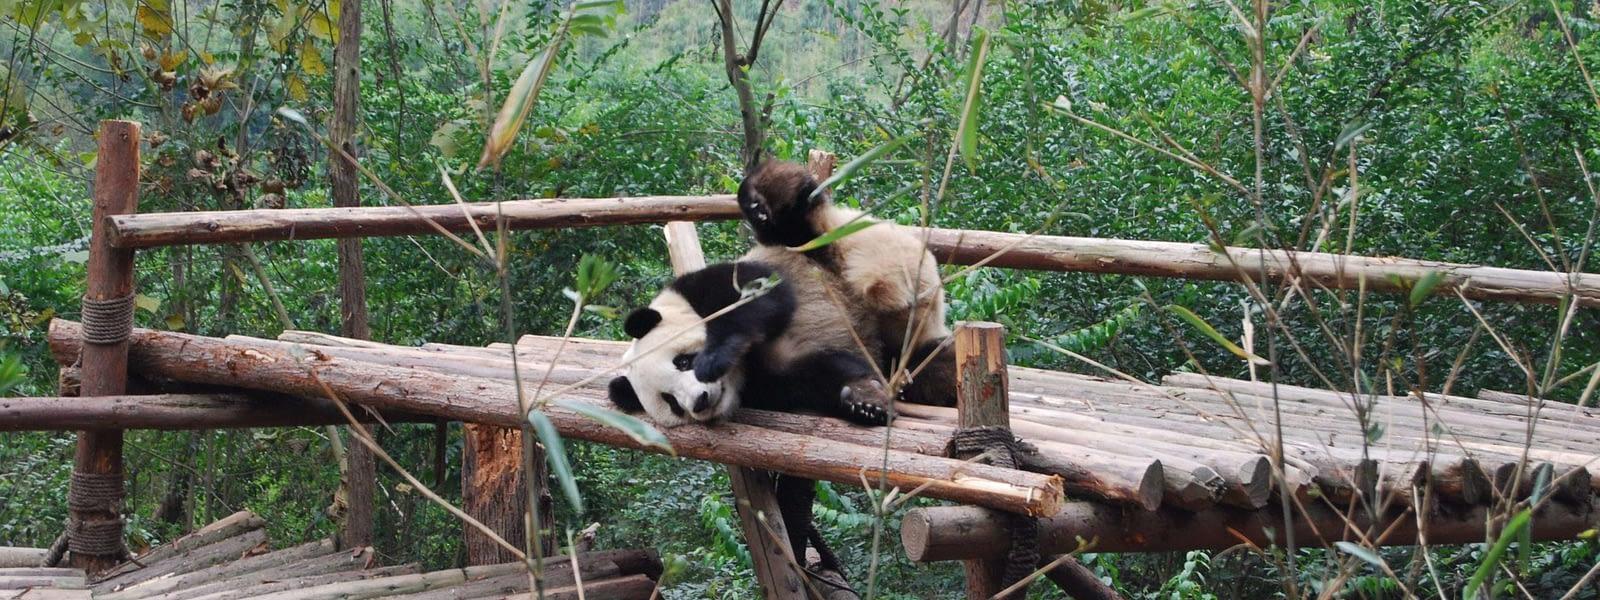 China Panda Breeding Center Chengdu China